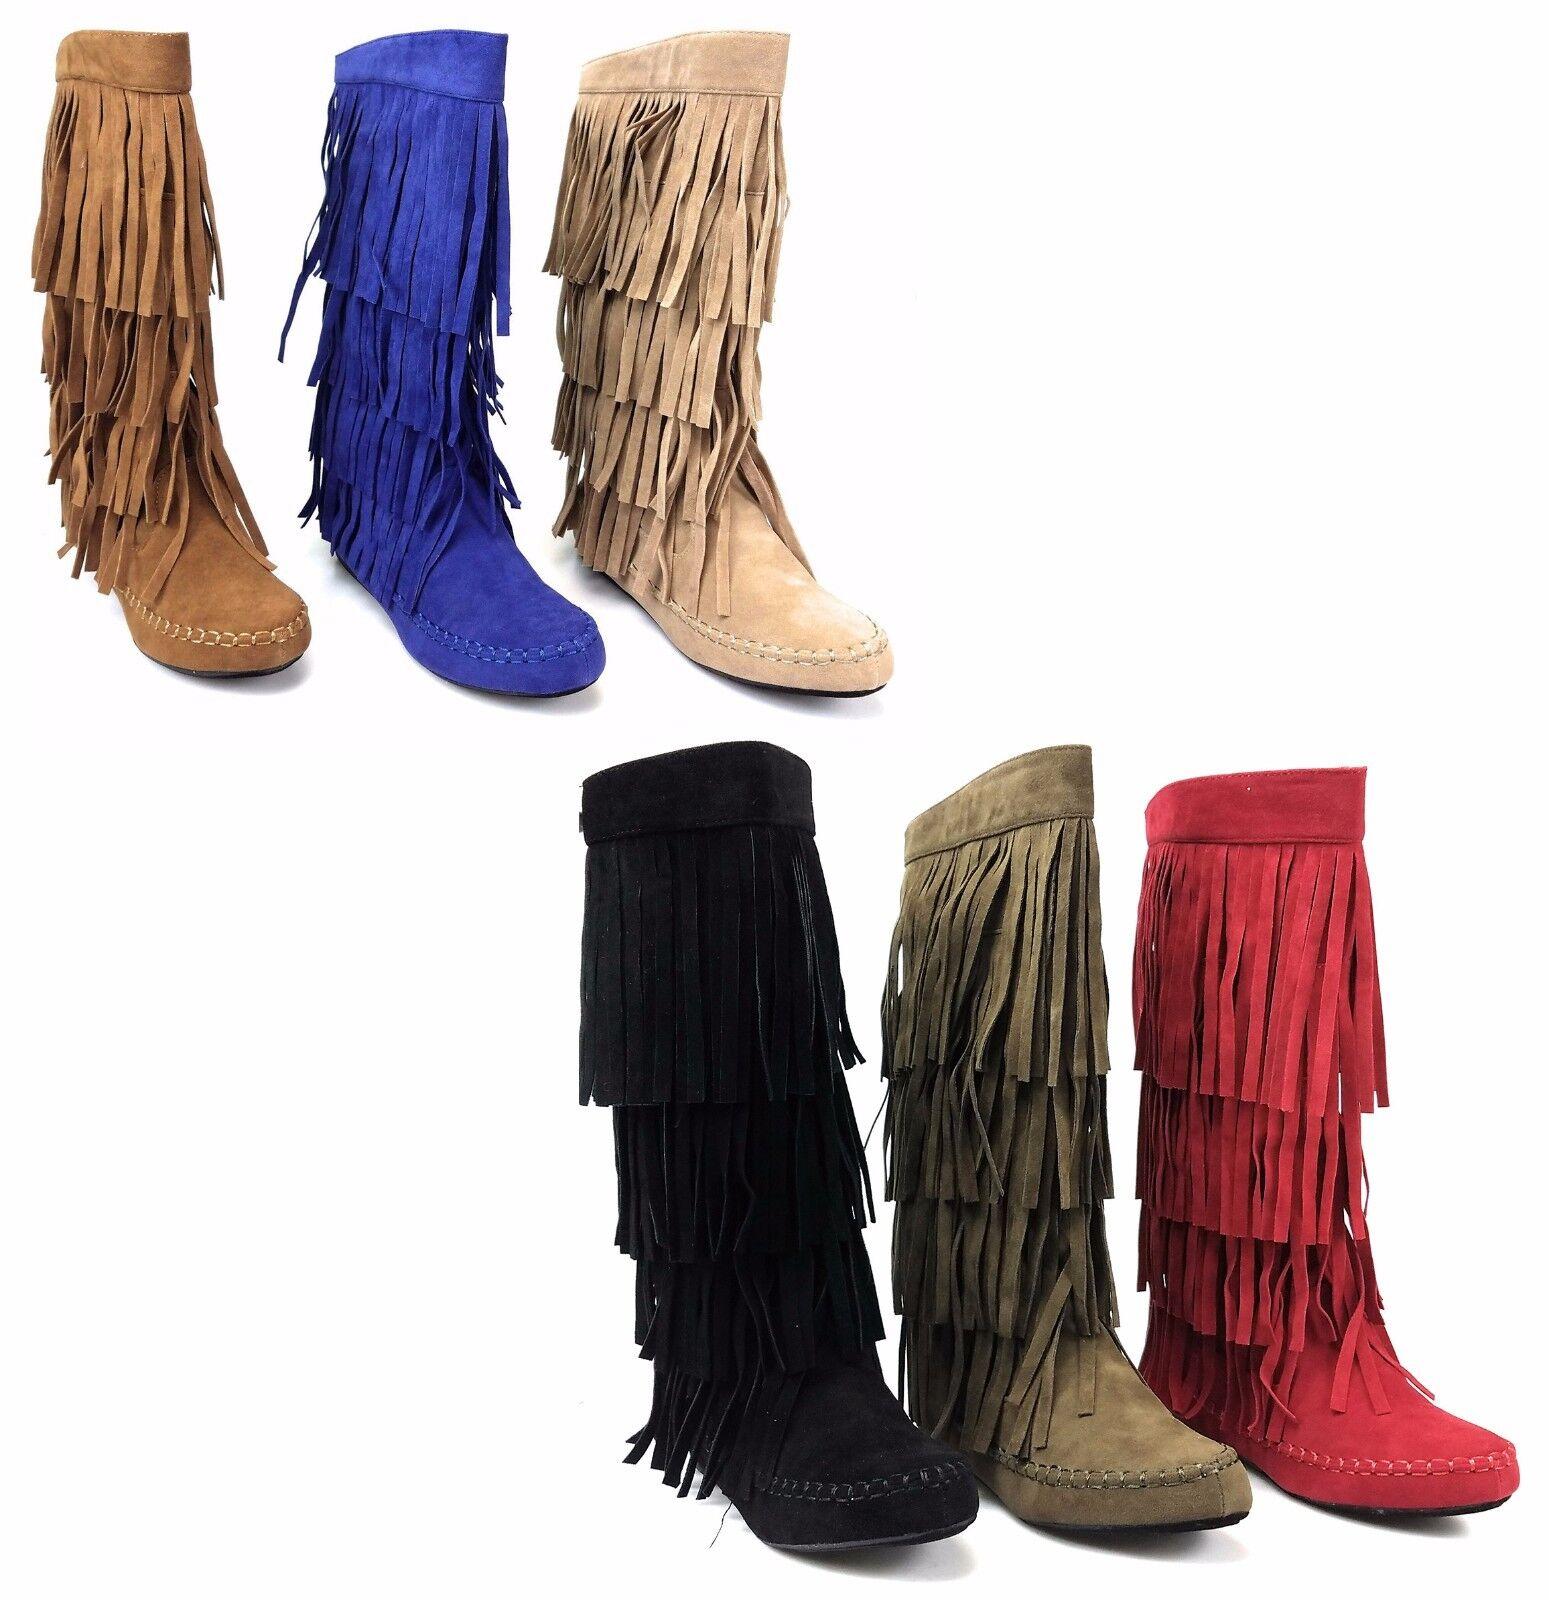 Womens 4 Layer Fringe Flat Boots Moccasin Mid Calf Comfy Boots Rust Yoki Mudd-55